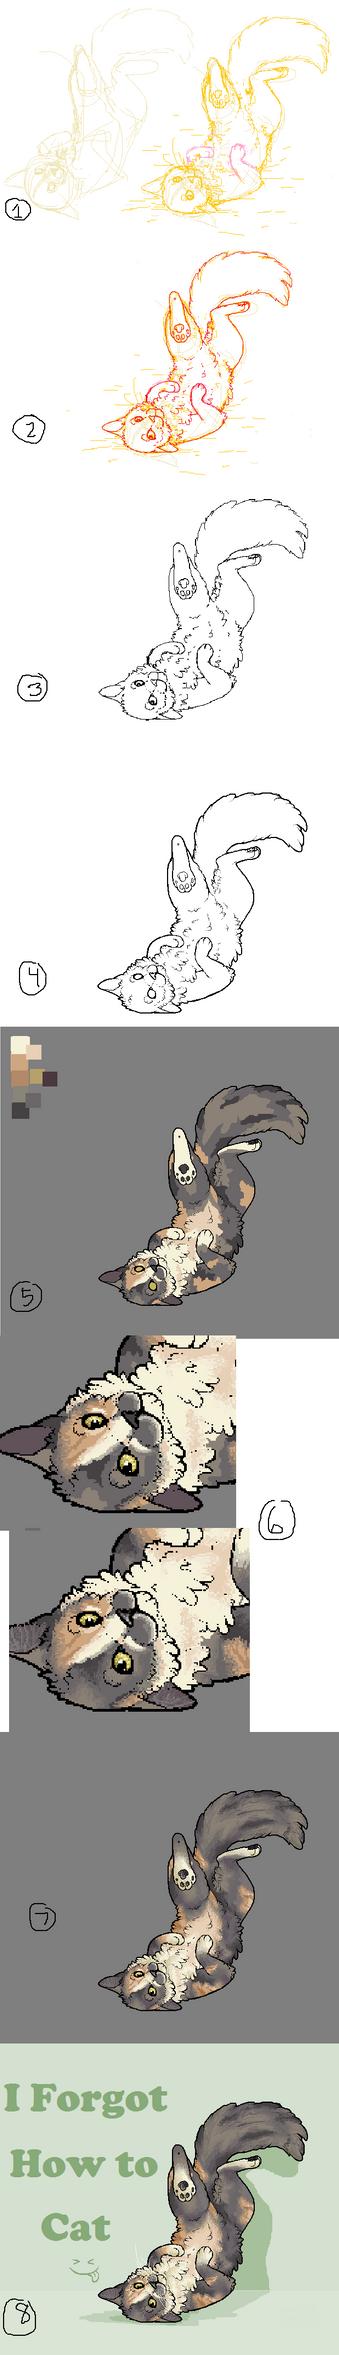 I Forgot How to Cat WALKTHROUGH by Blubird101